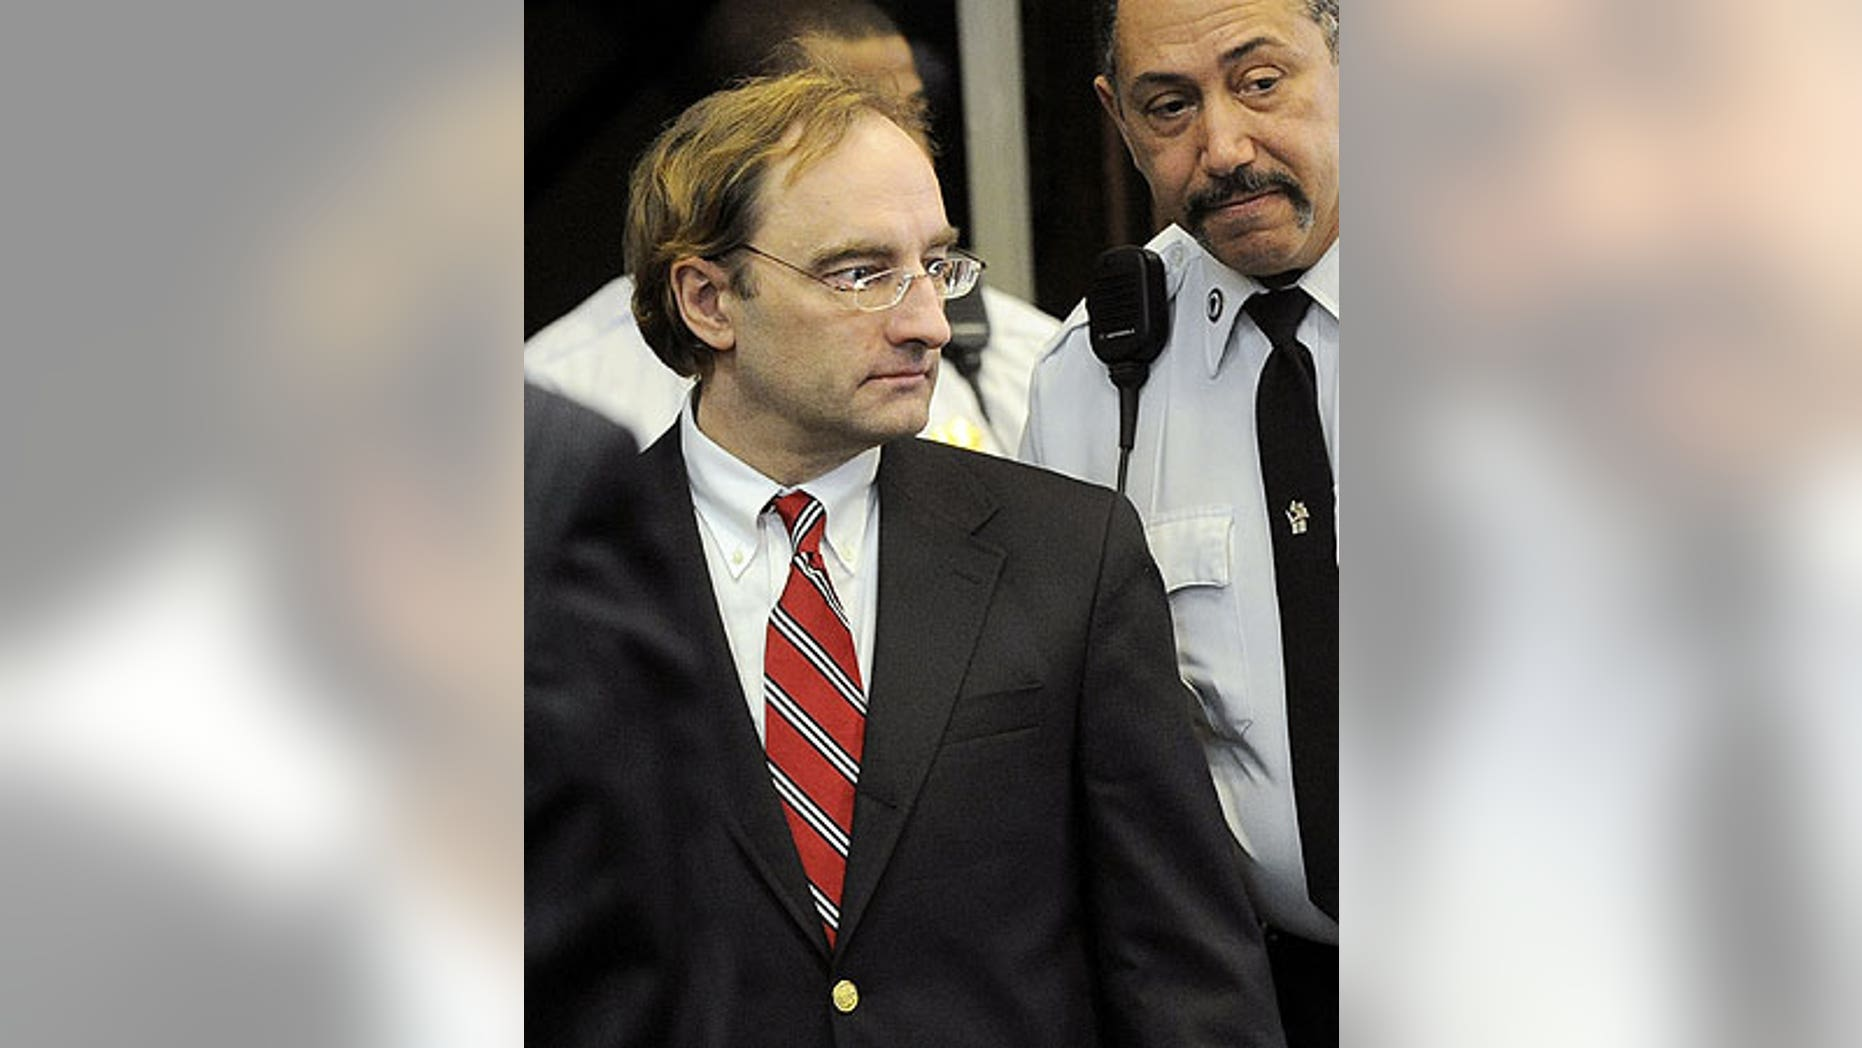 Dec. 1, 2008: Christian Karl Gerhartsreiter, who calls himself Clark Rockefeller, arrives for a hearing at Suffolk Superior Court.